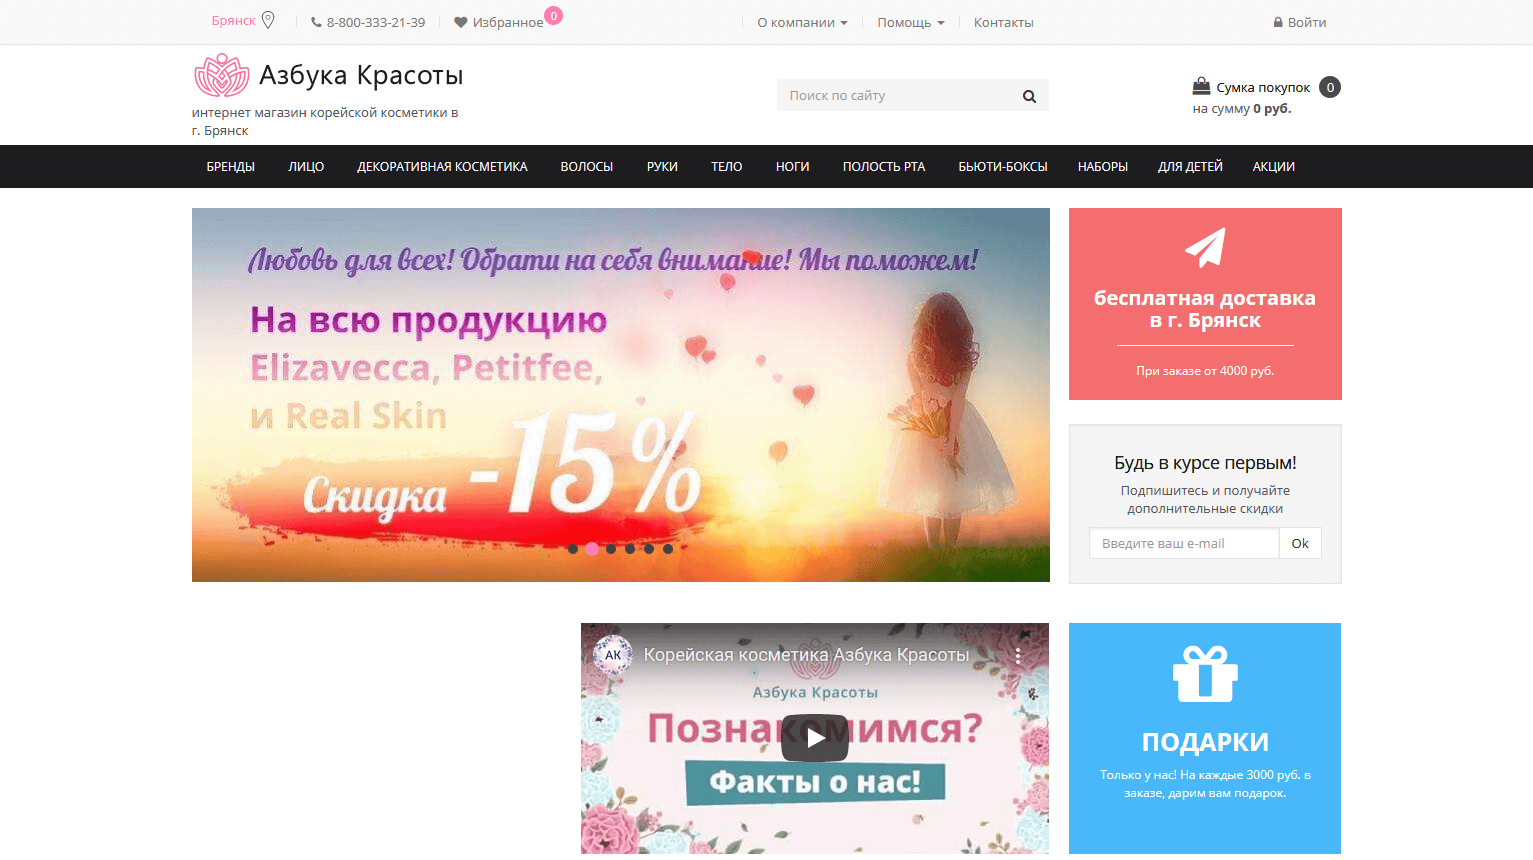 azbuka-krasoti.ru продвижение магазина корейской косметики